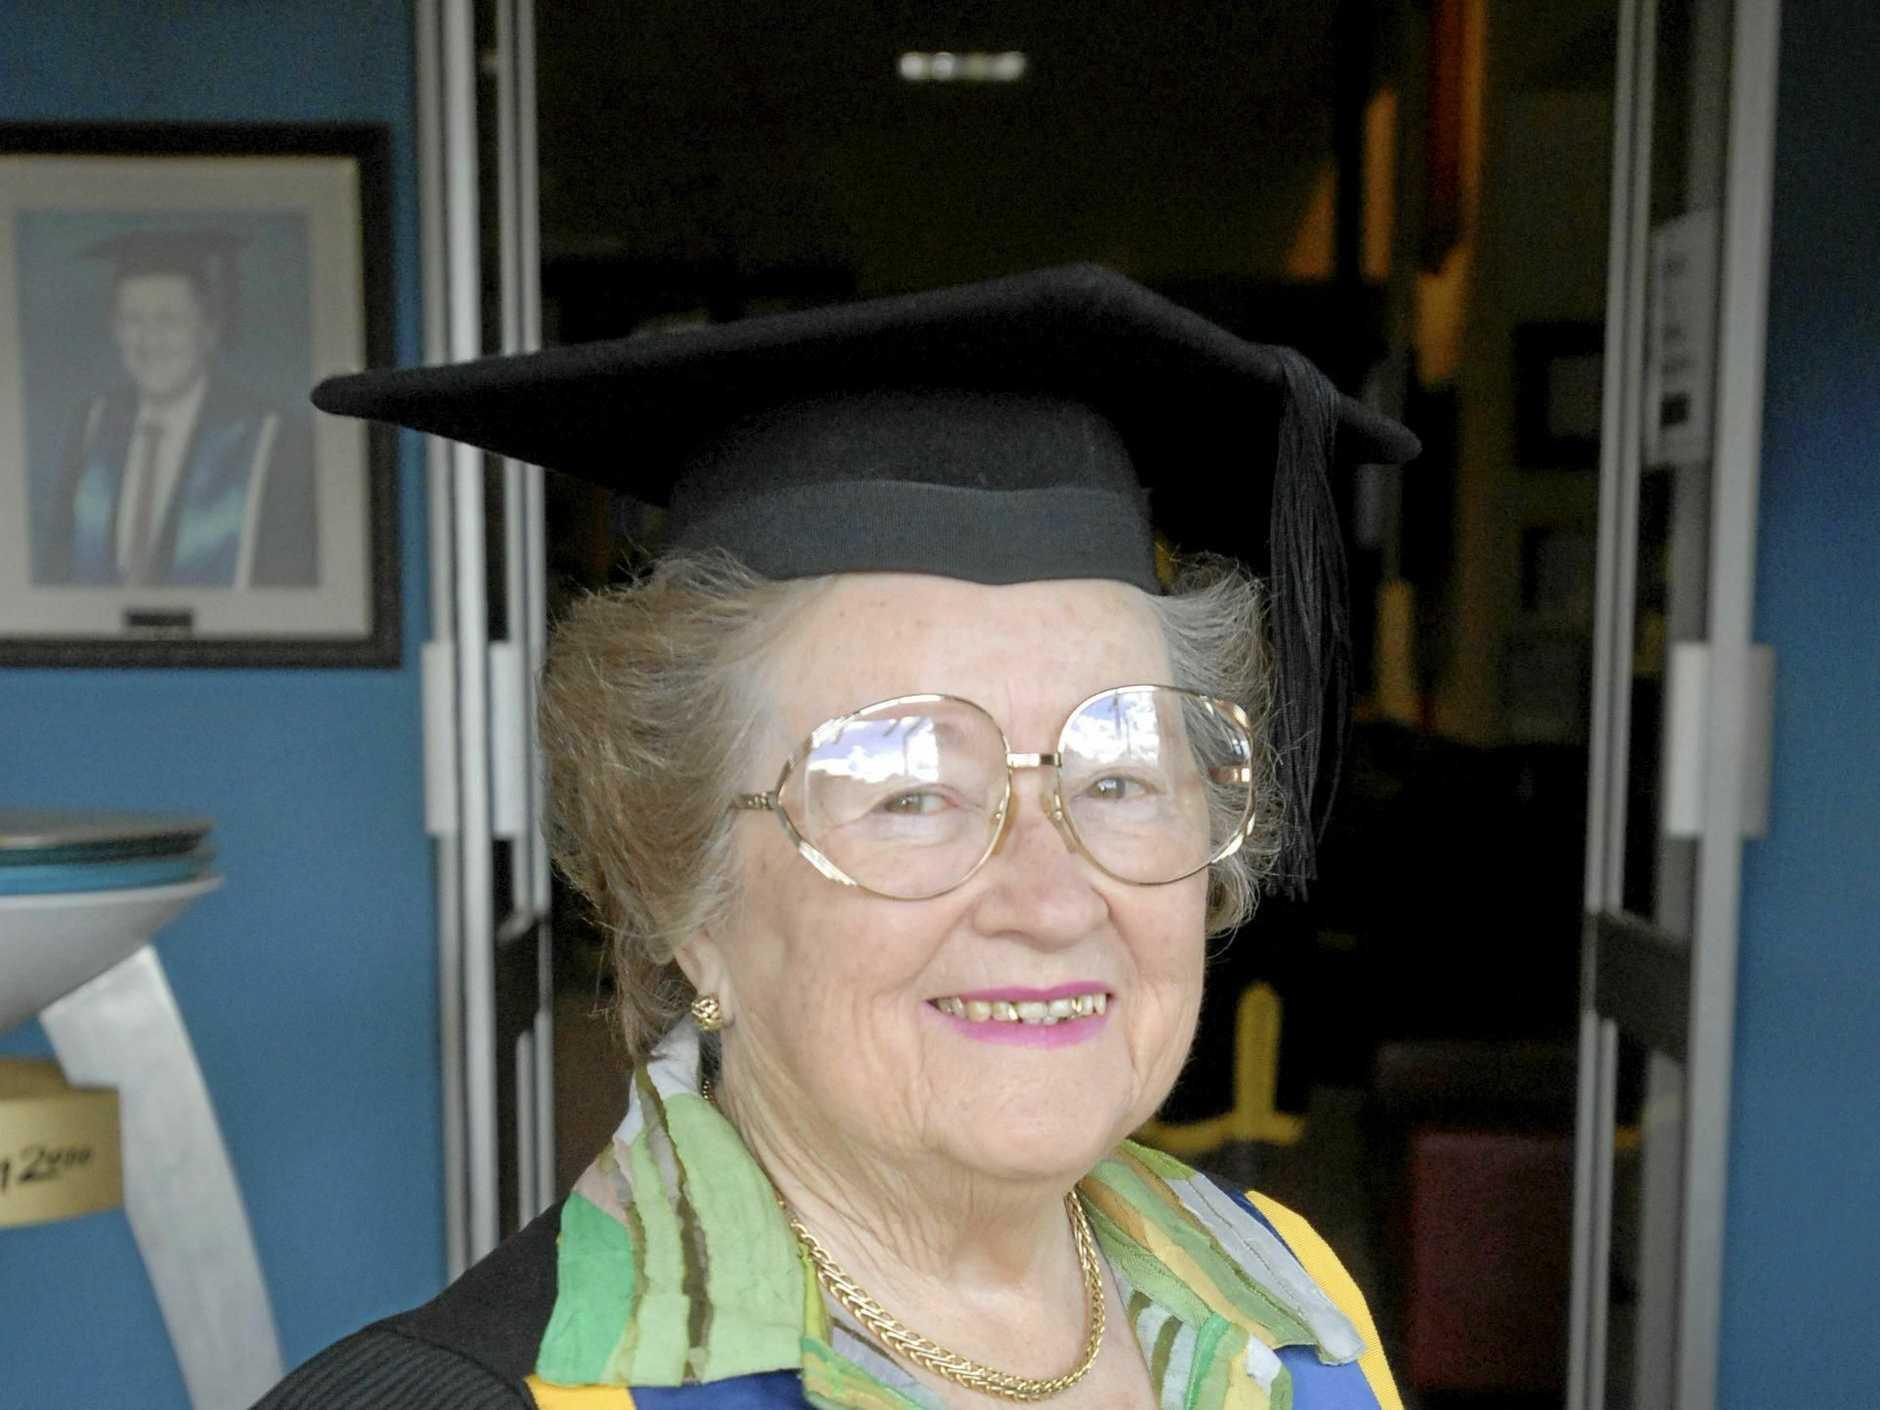 Dellys Kelly died aged 86.